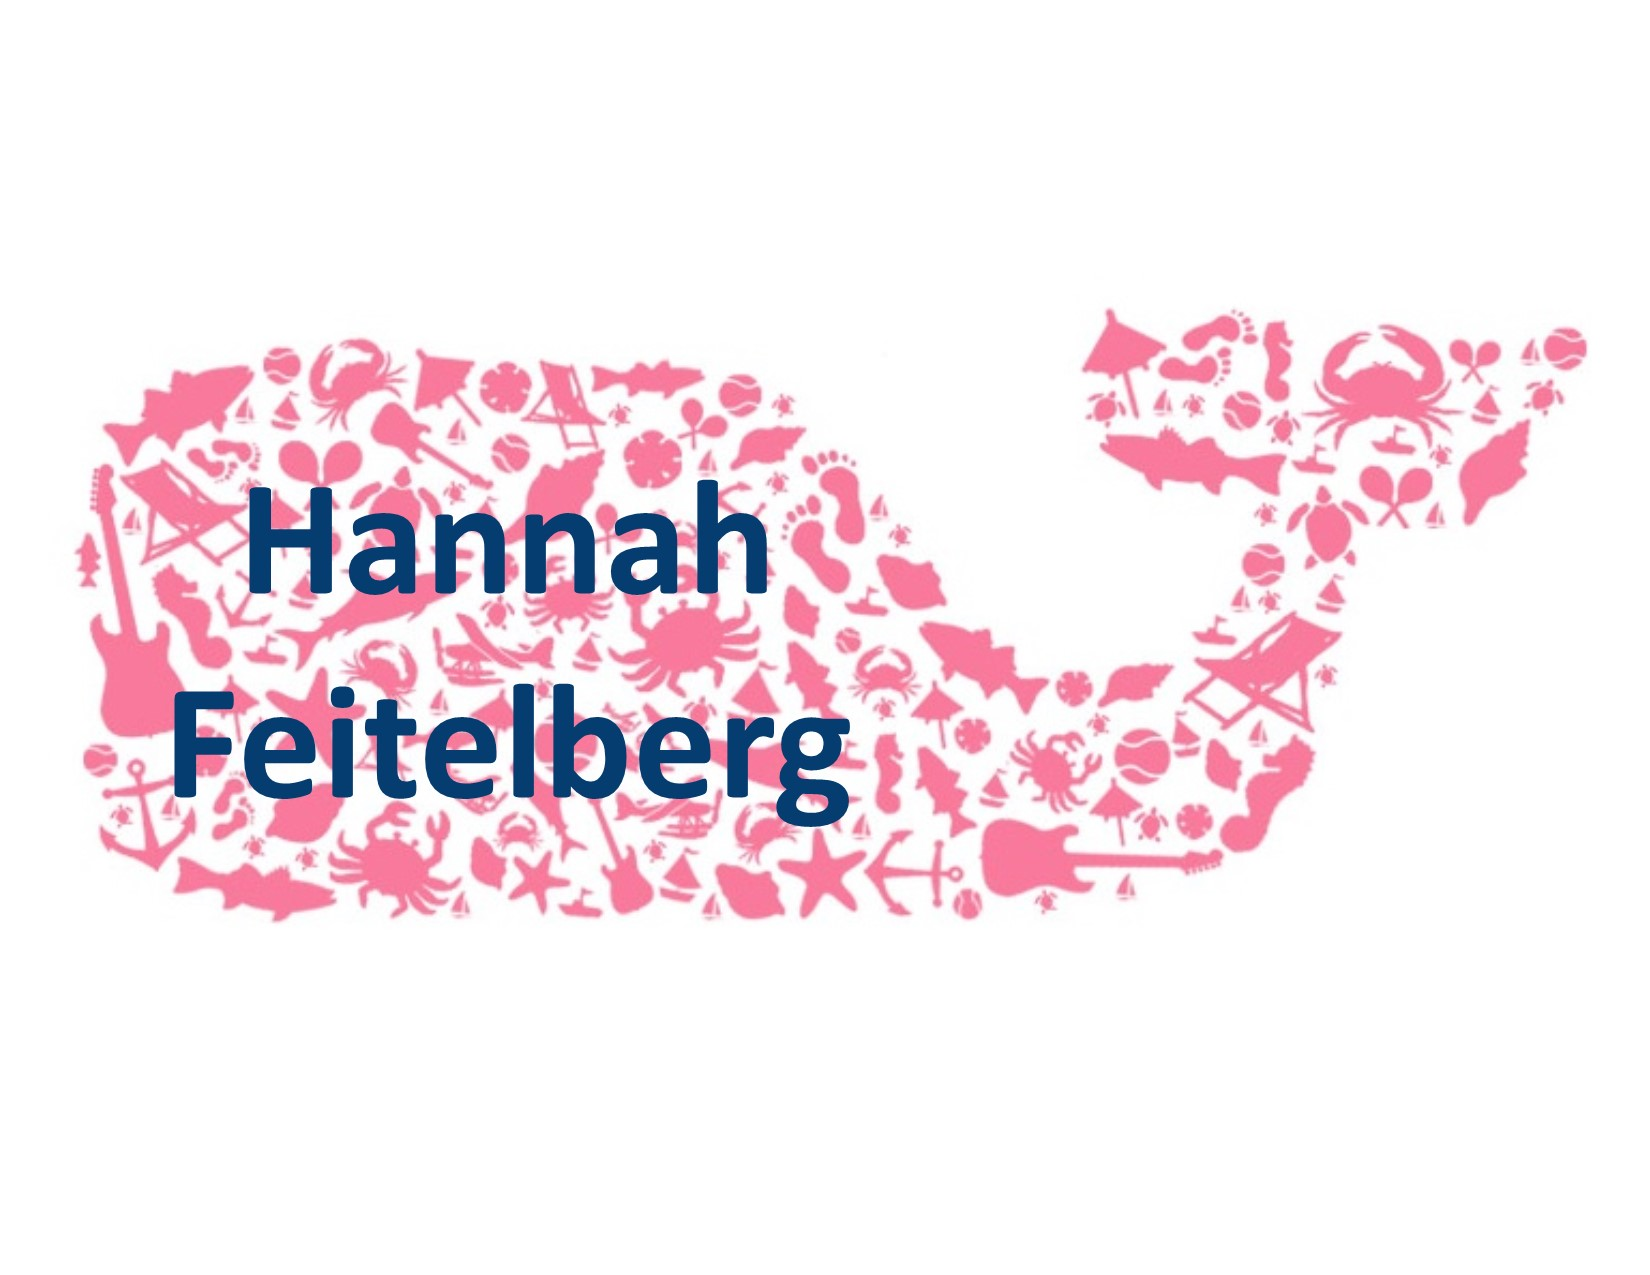 Feitelberg, Hannah.jpg